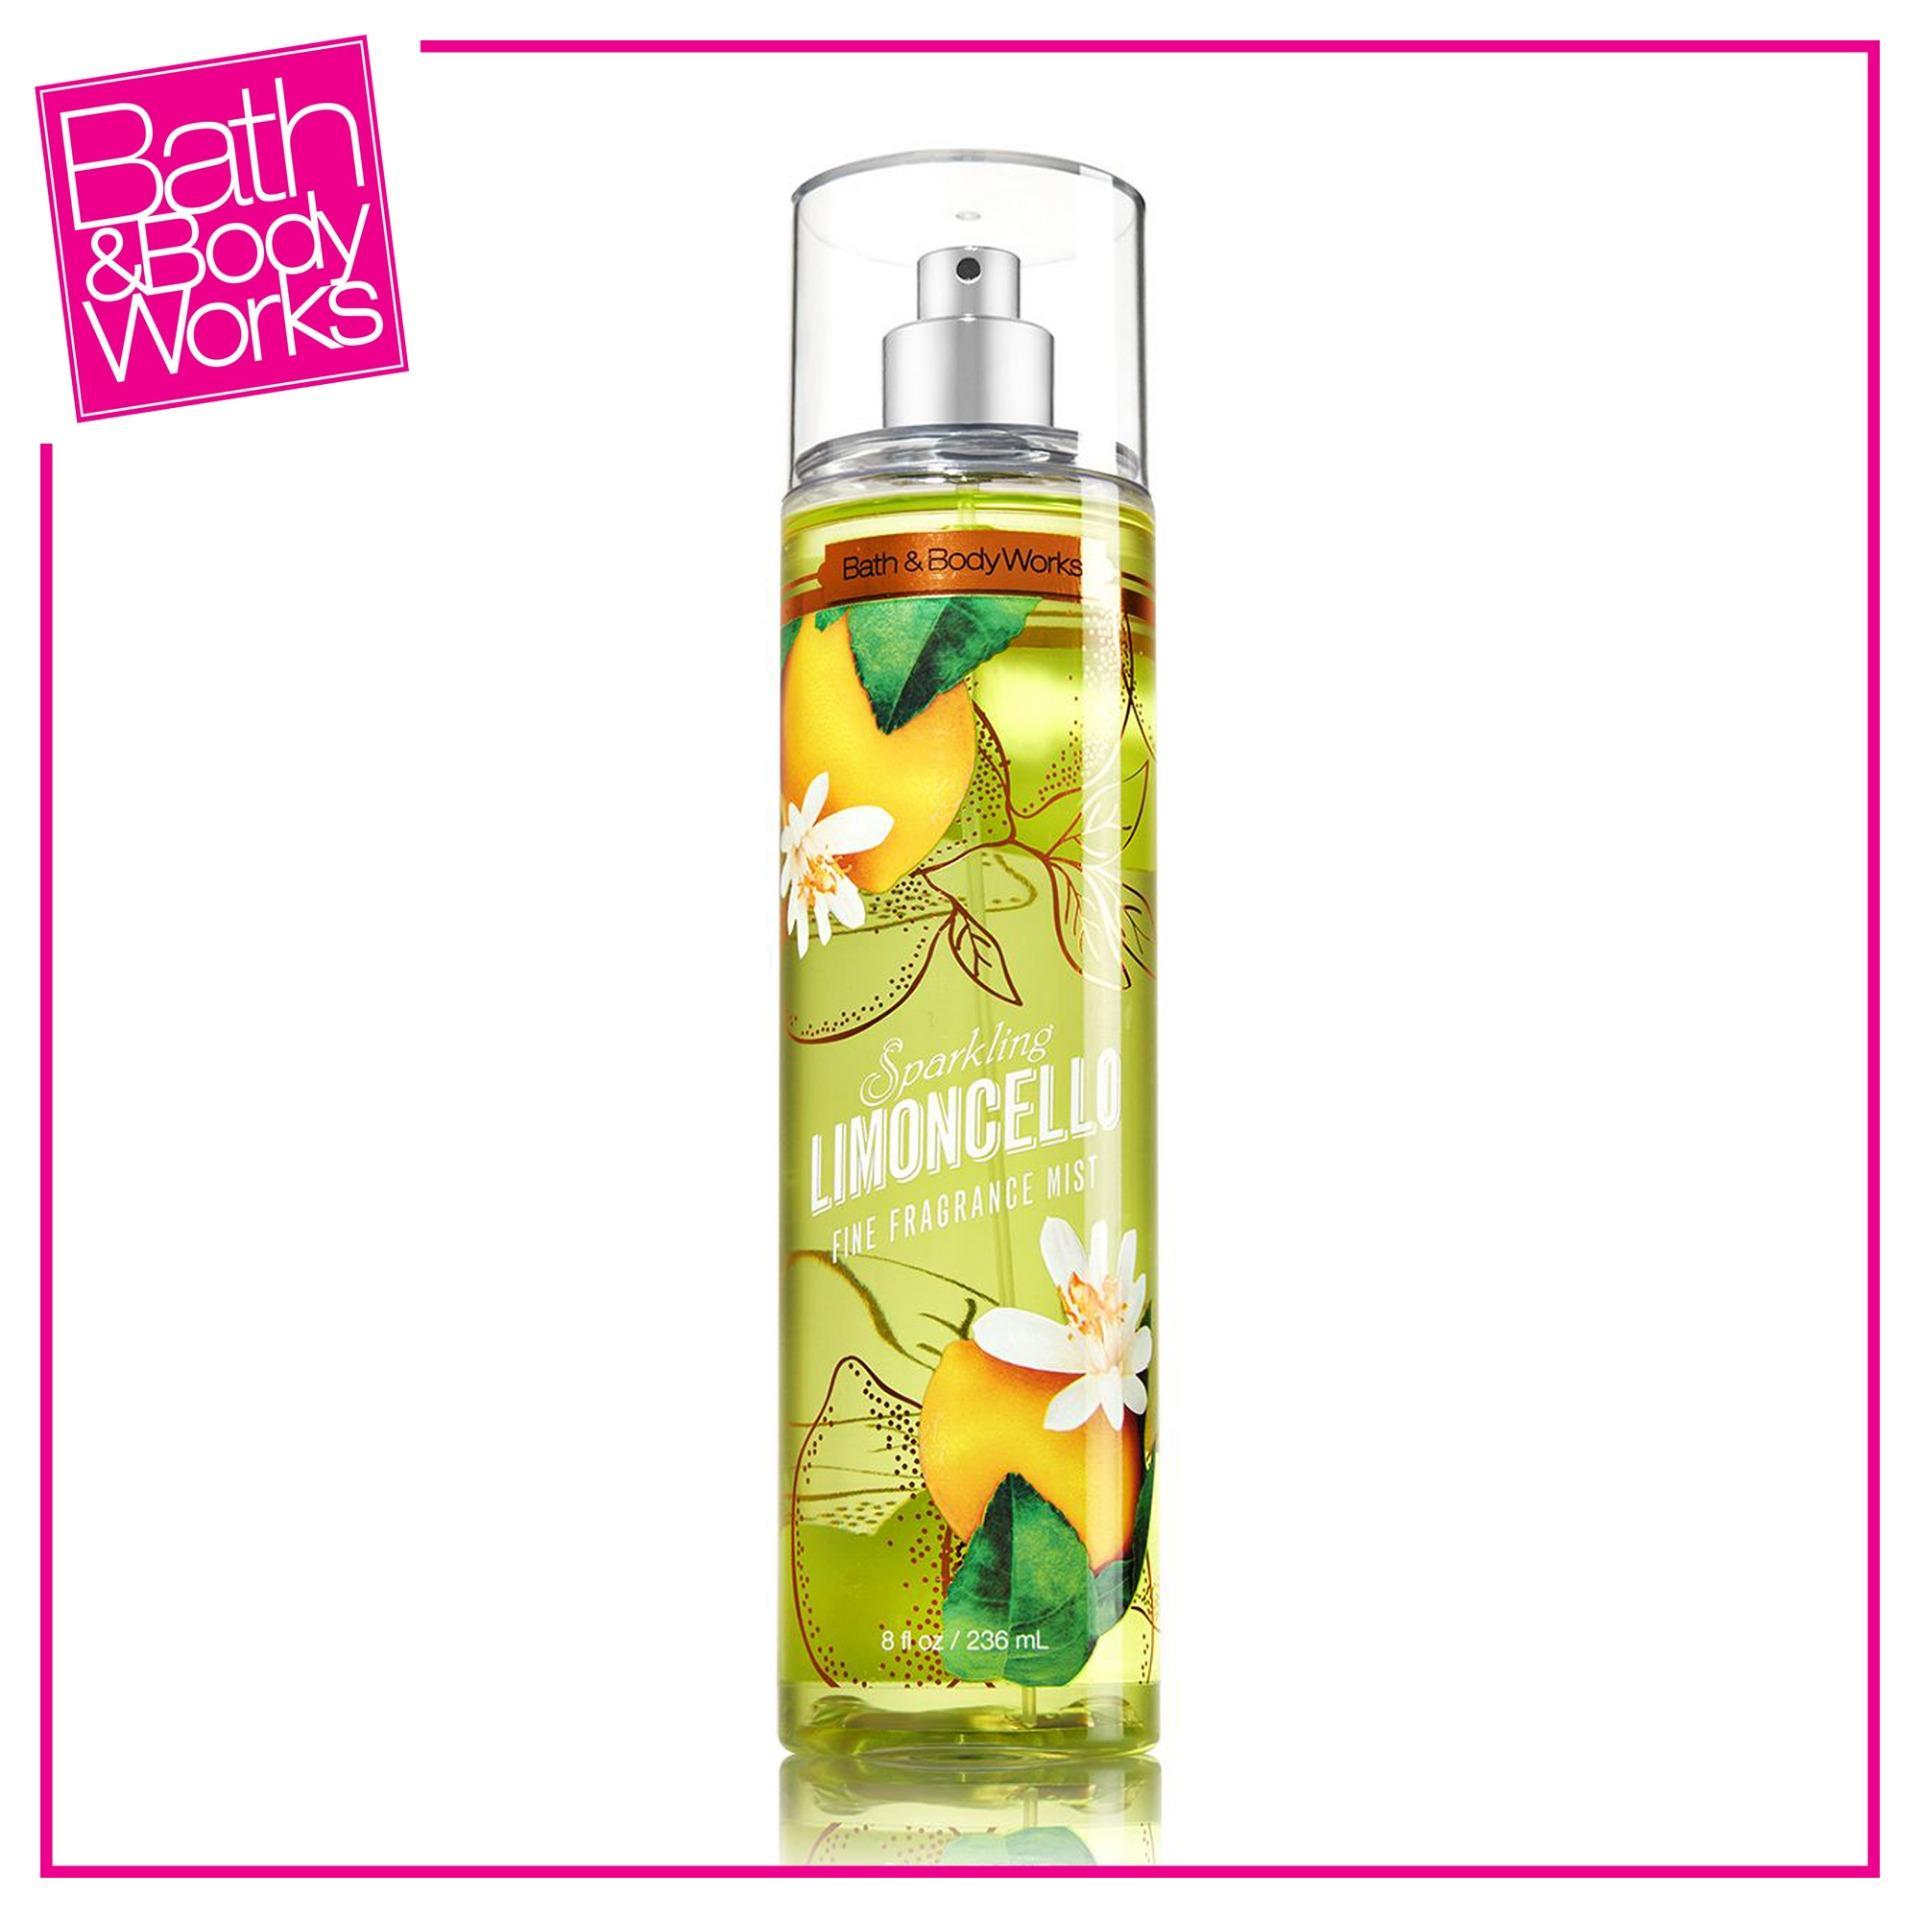 Bath And Body Works Fragrances Philippines Spray Twilight Woods For Men Sparkling Limoncello Fine Fragrance Mist 236ml